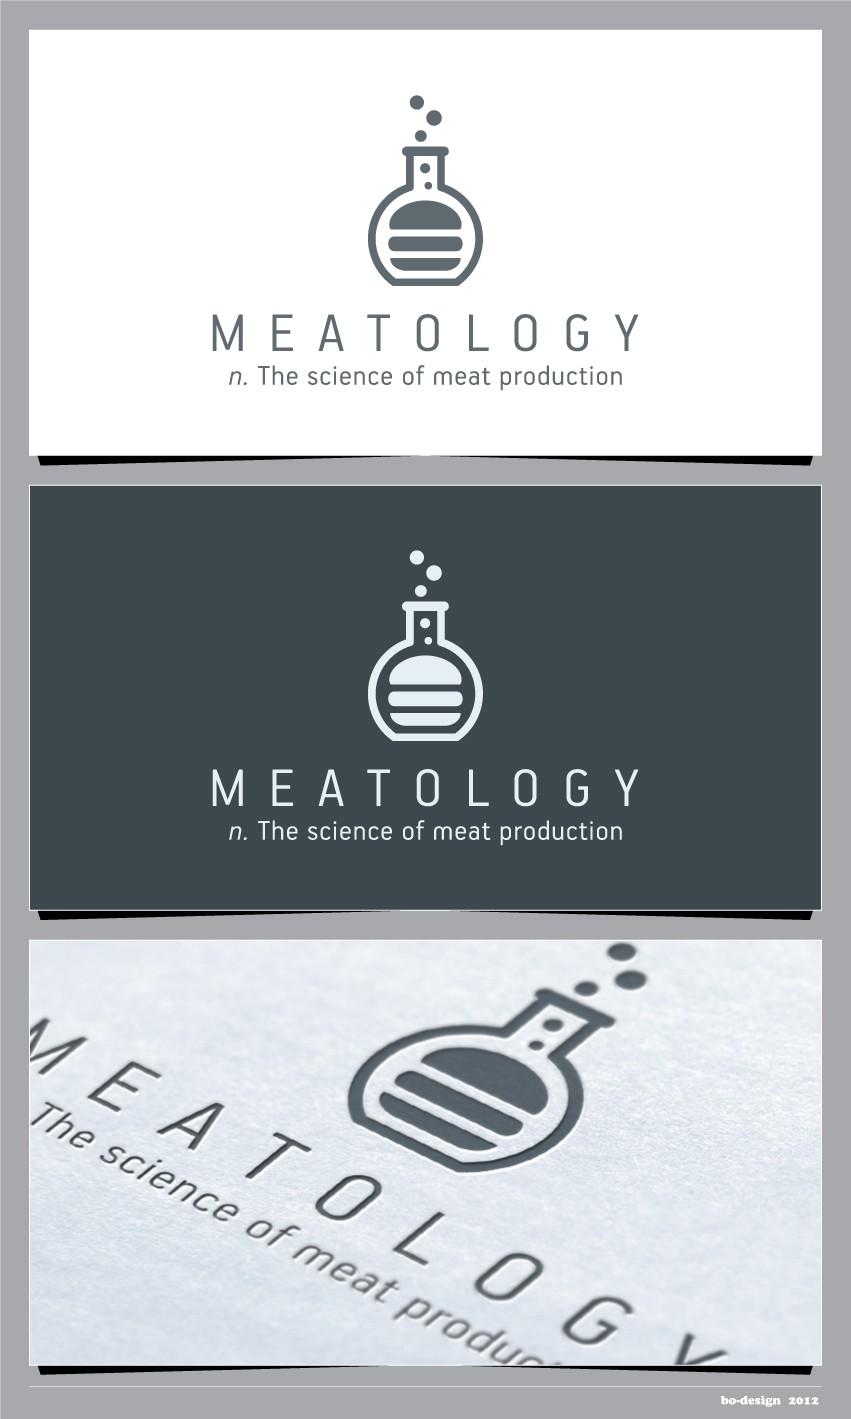 Meatology needs a new logo